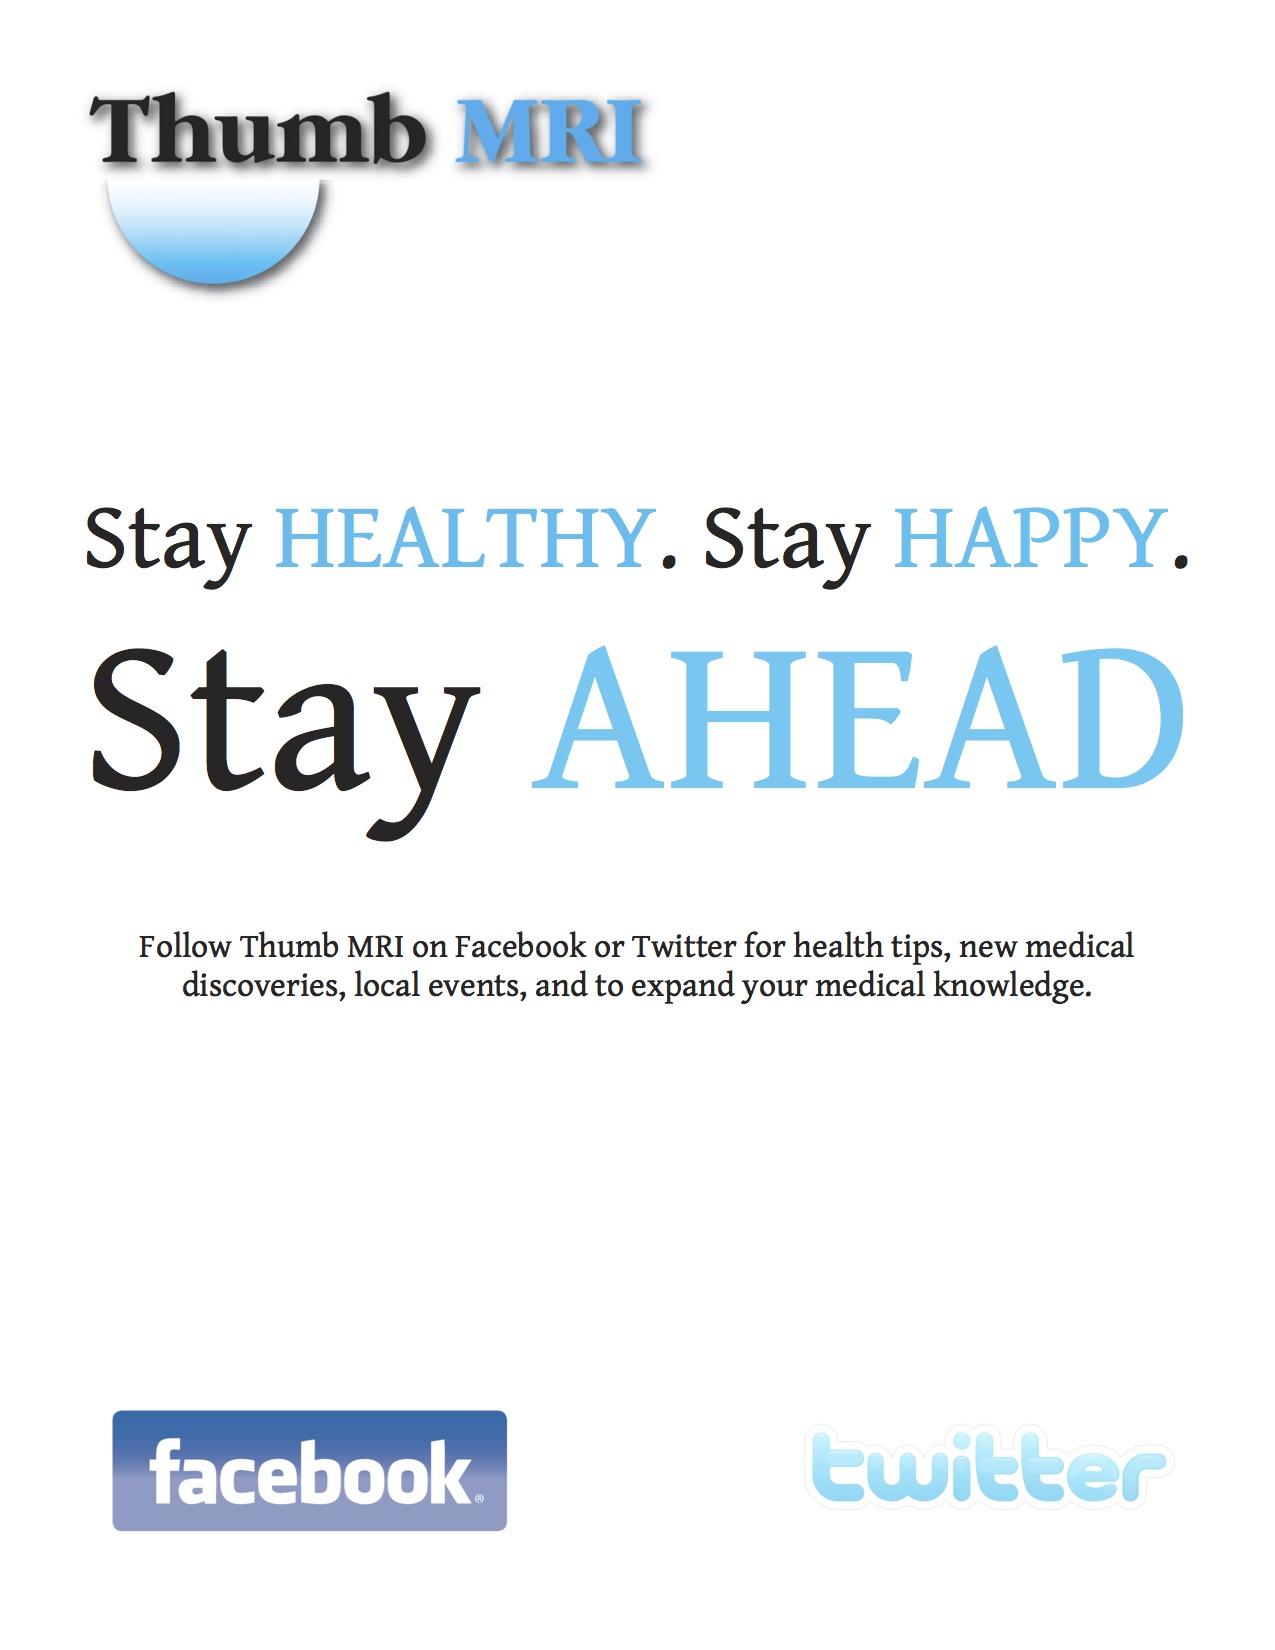 stay ahead social ad with logo.jpg